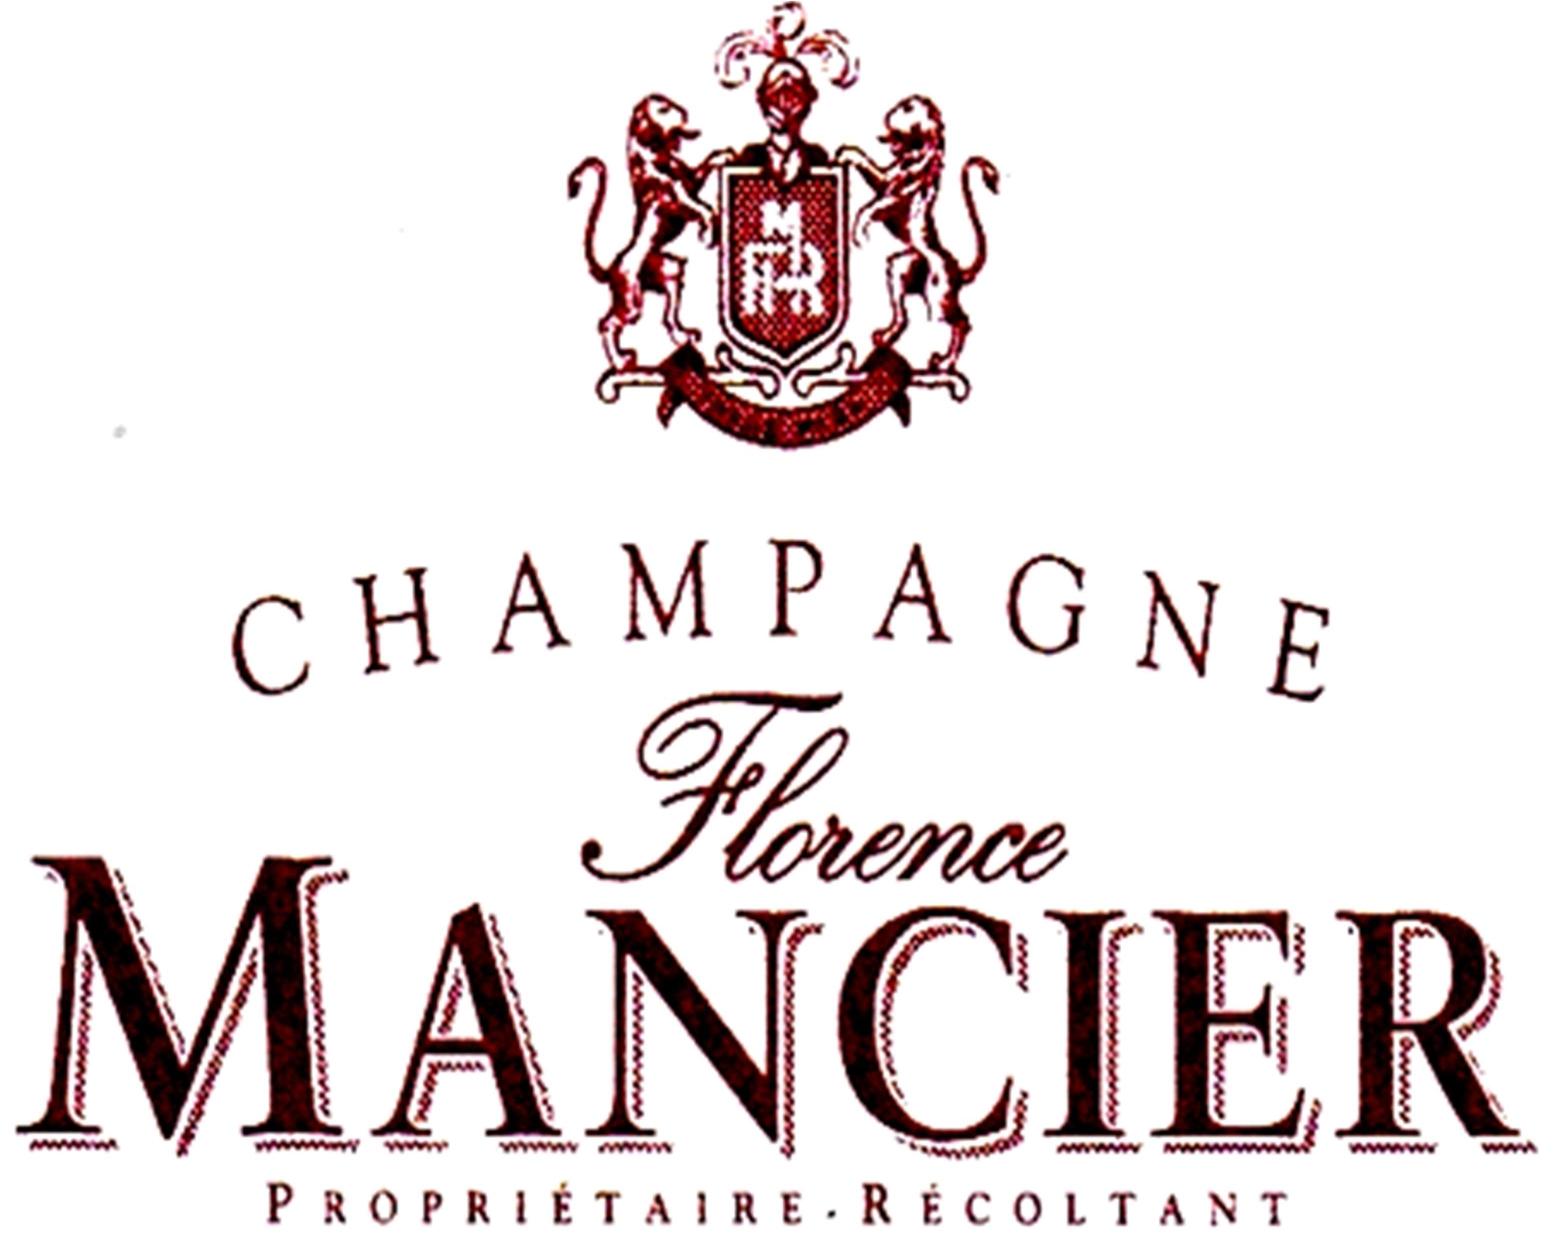 Florence Mancier